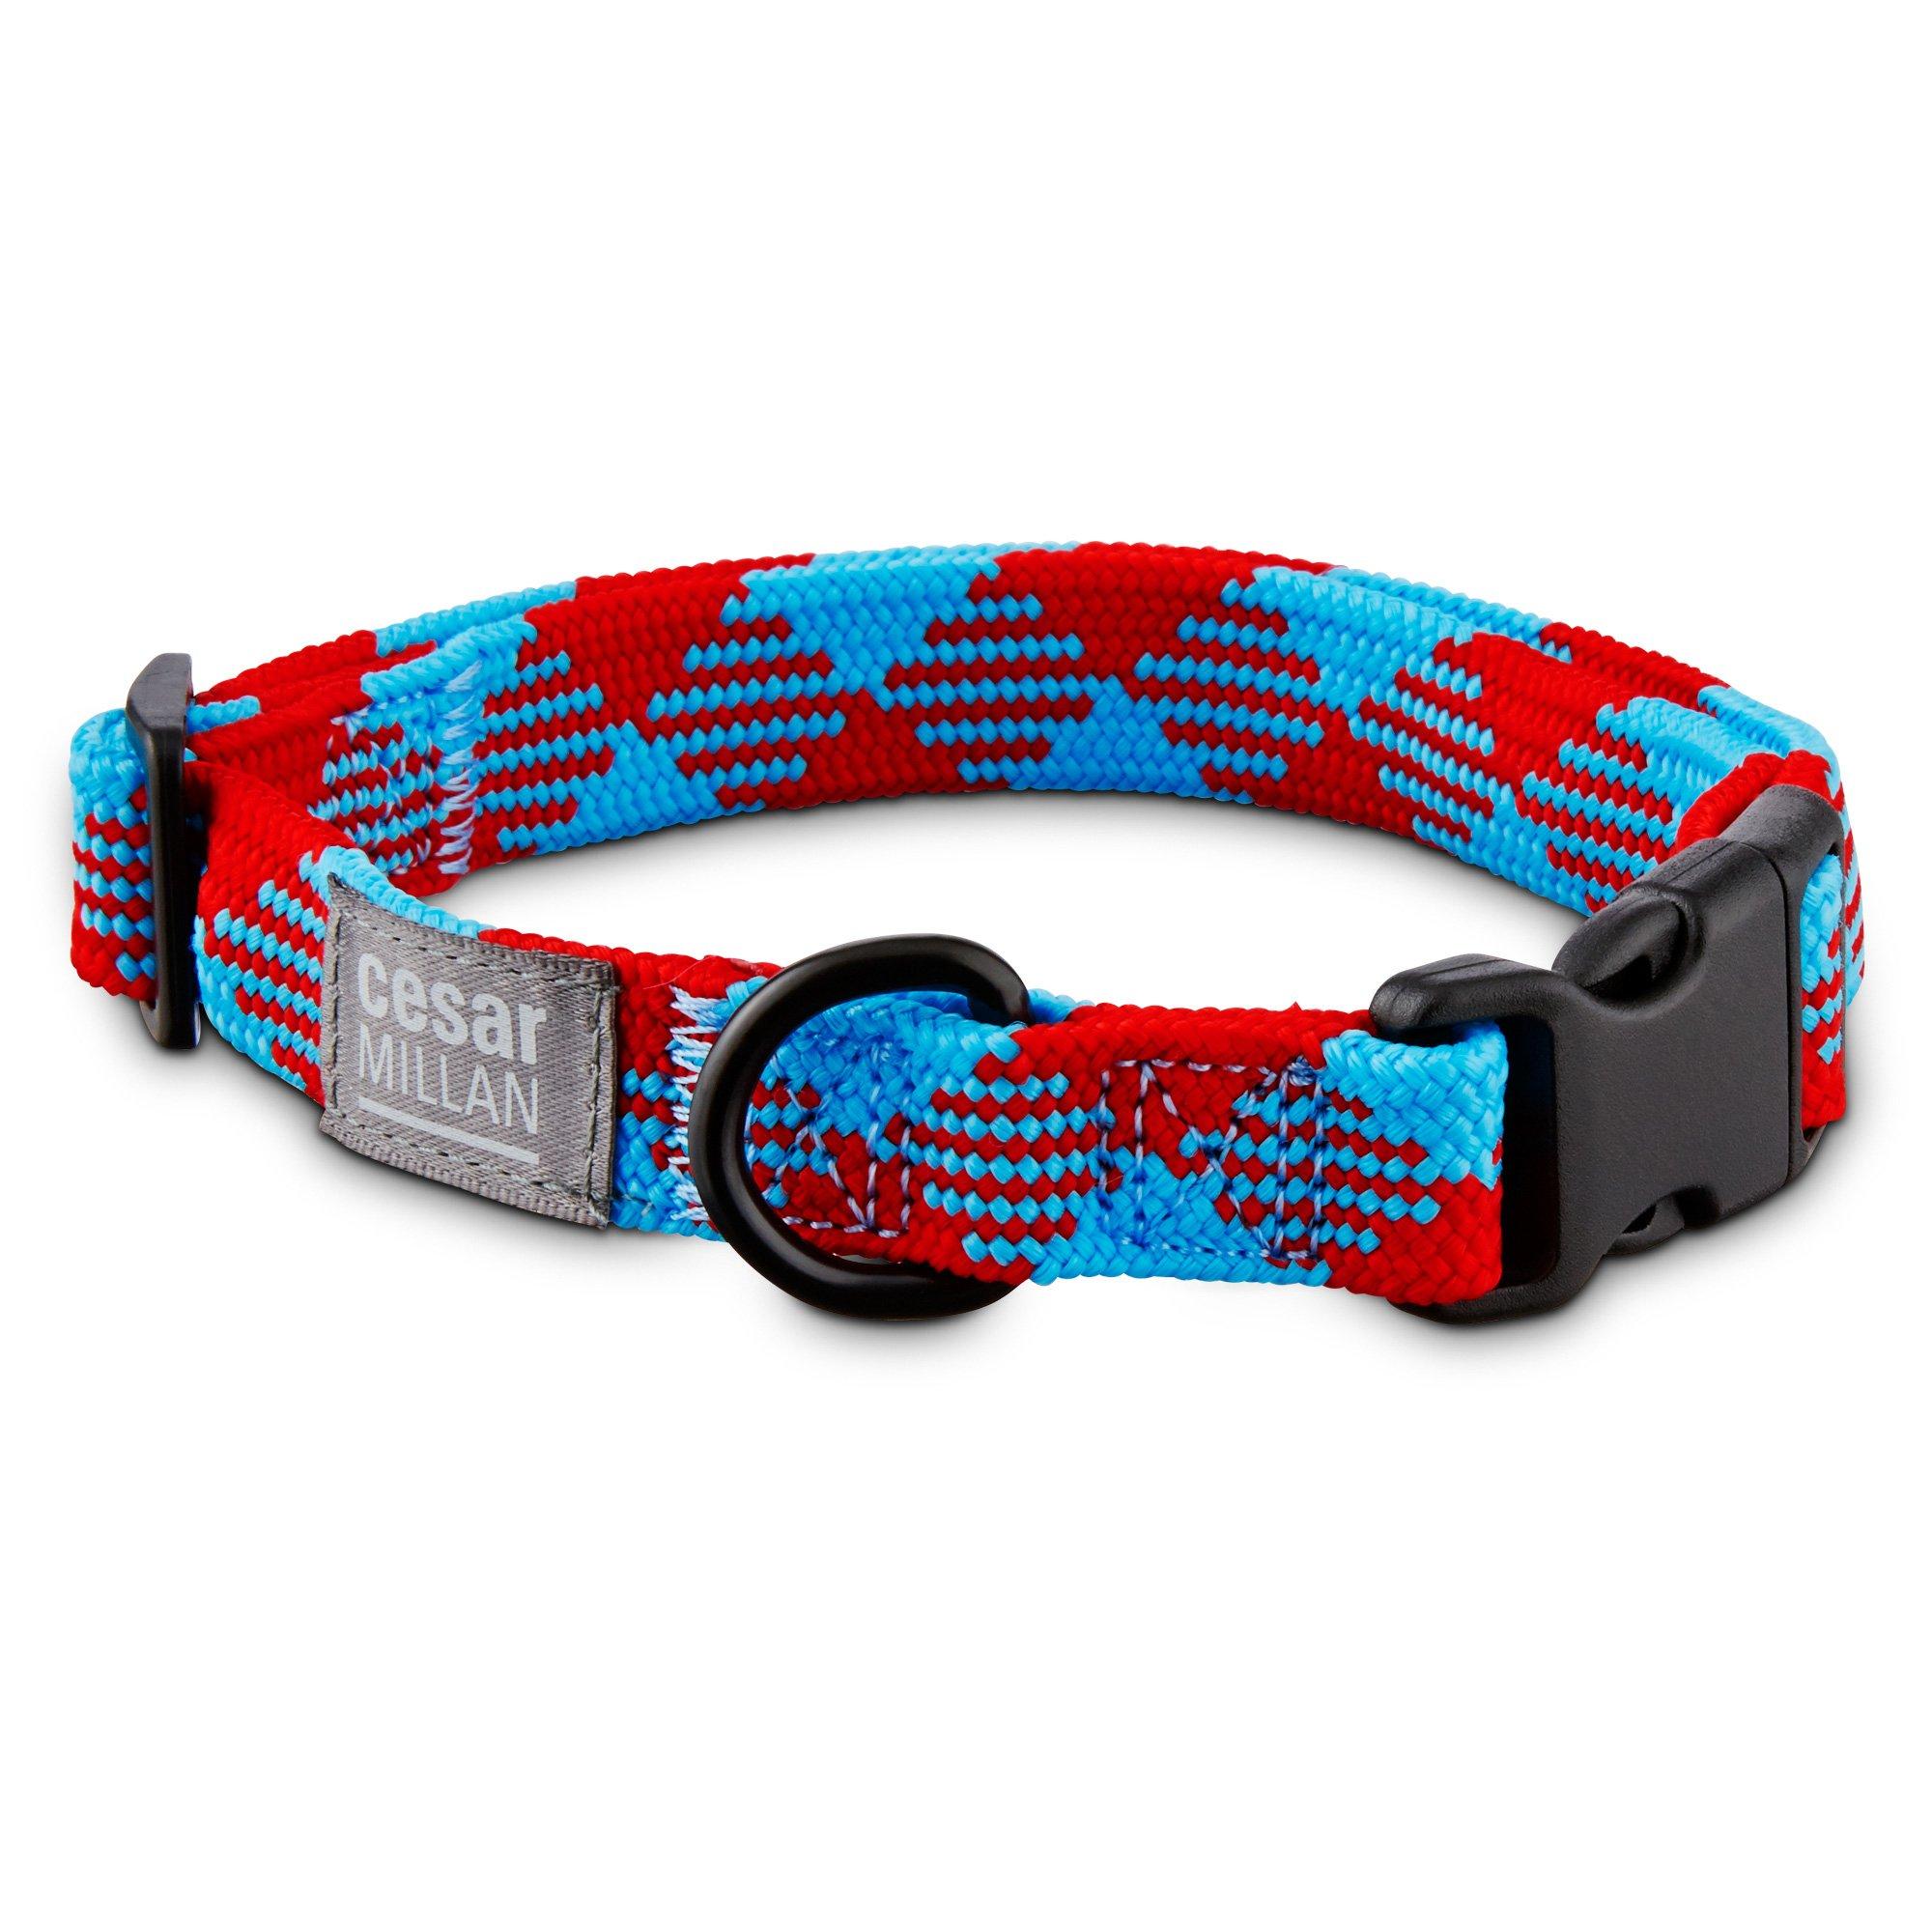 Cesar Millan Braided Brights Red & Blue Nylon Dog Collar